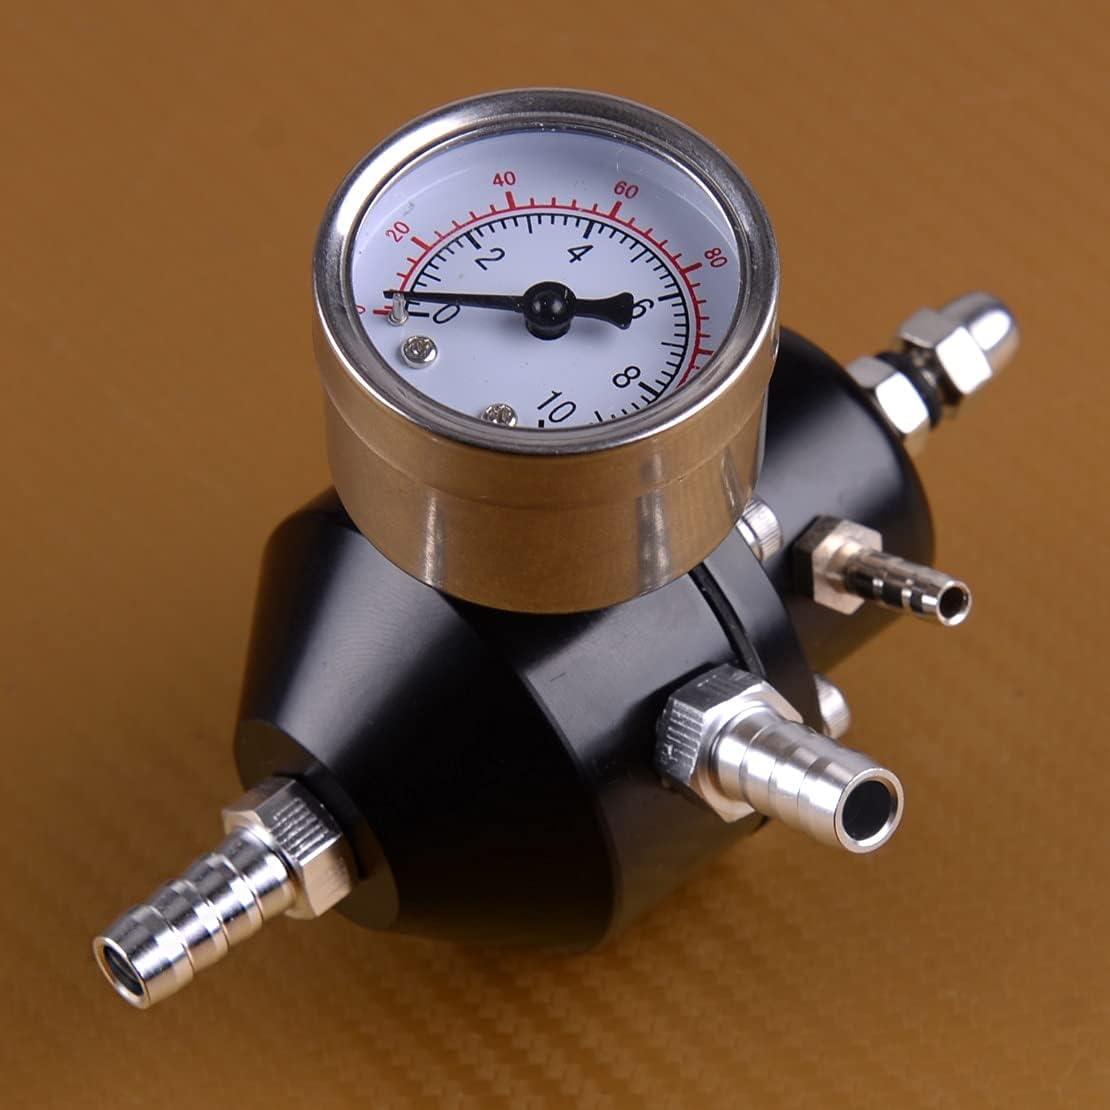 WFAANW Black Aluminum Tucson Mall Adjustable Pressure Fuel Universal Regulat Max 57% OFF